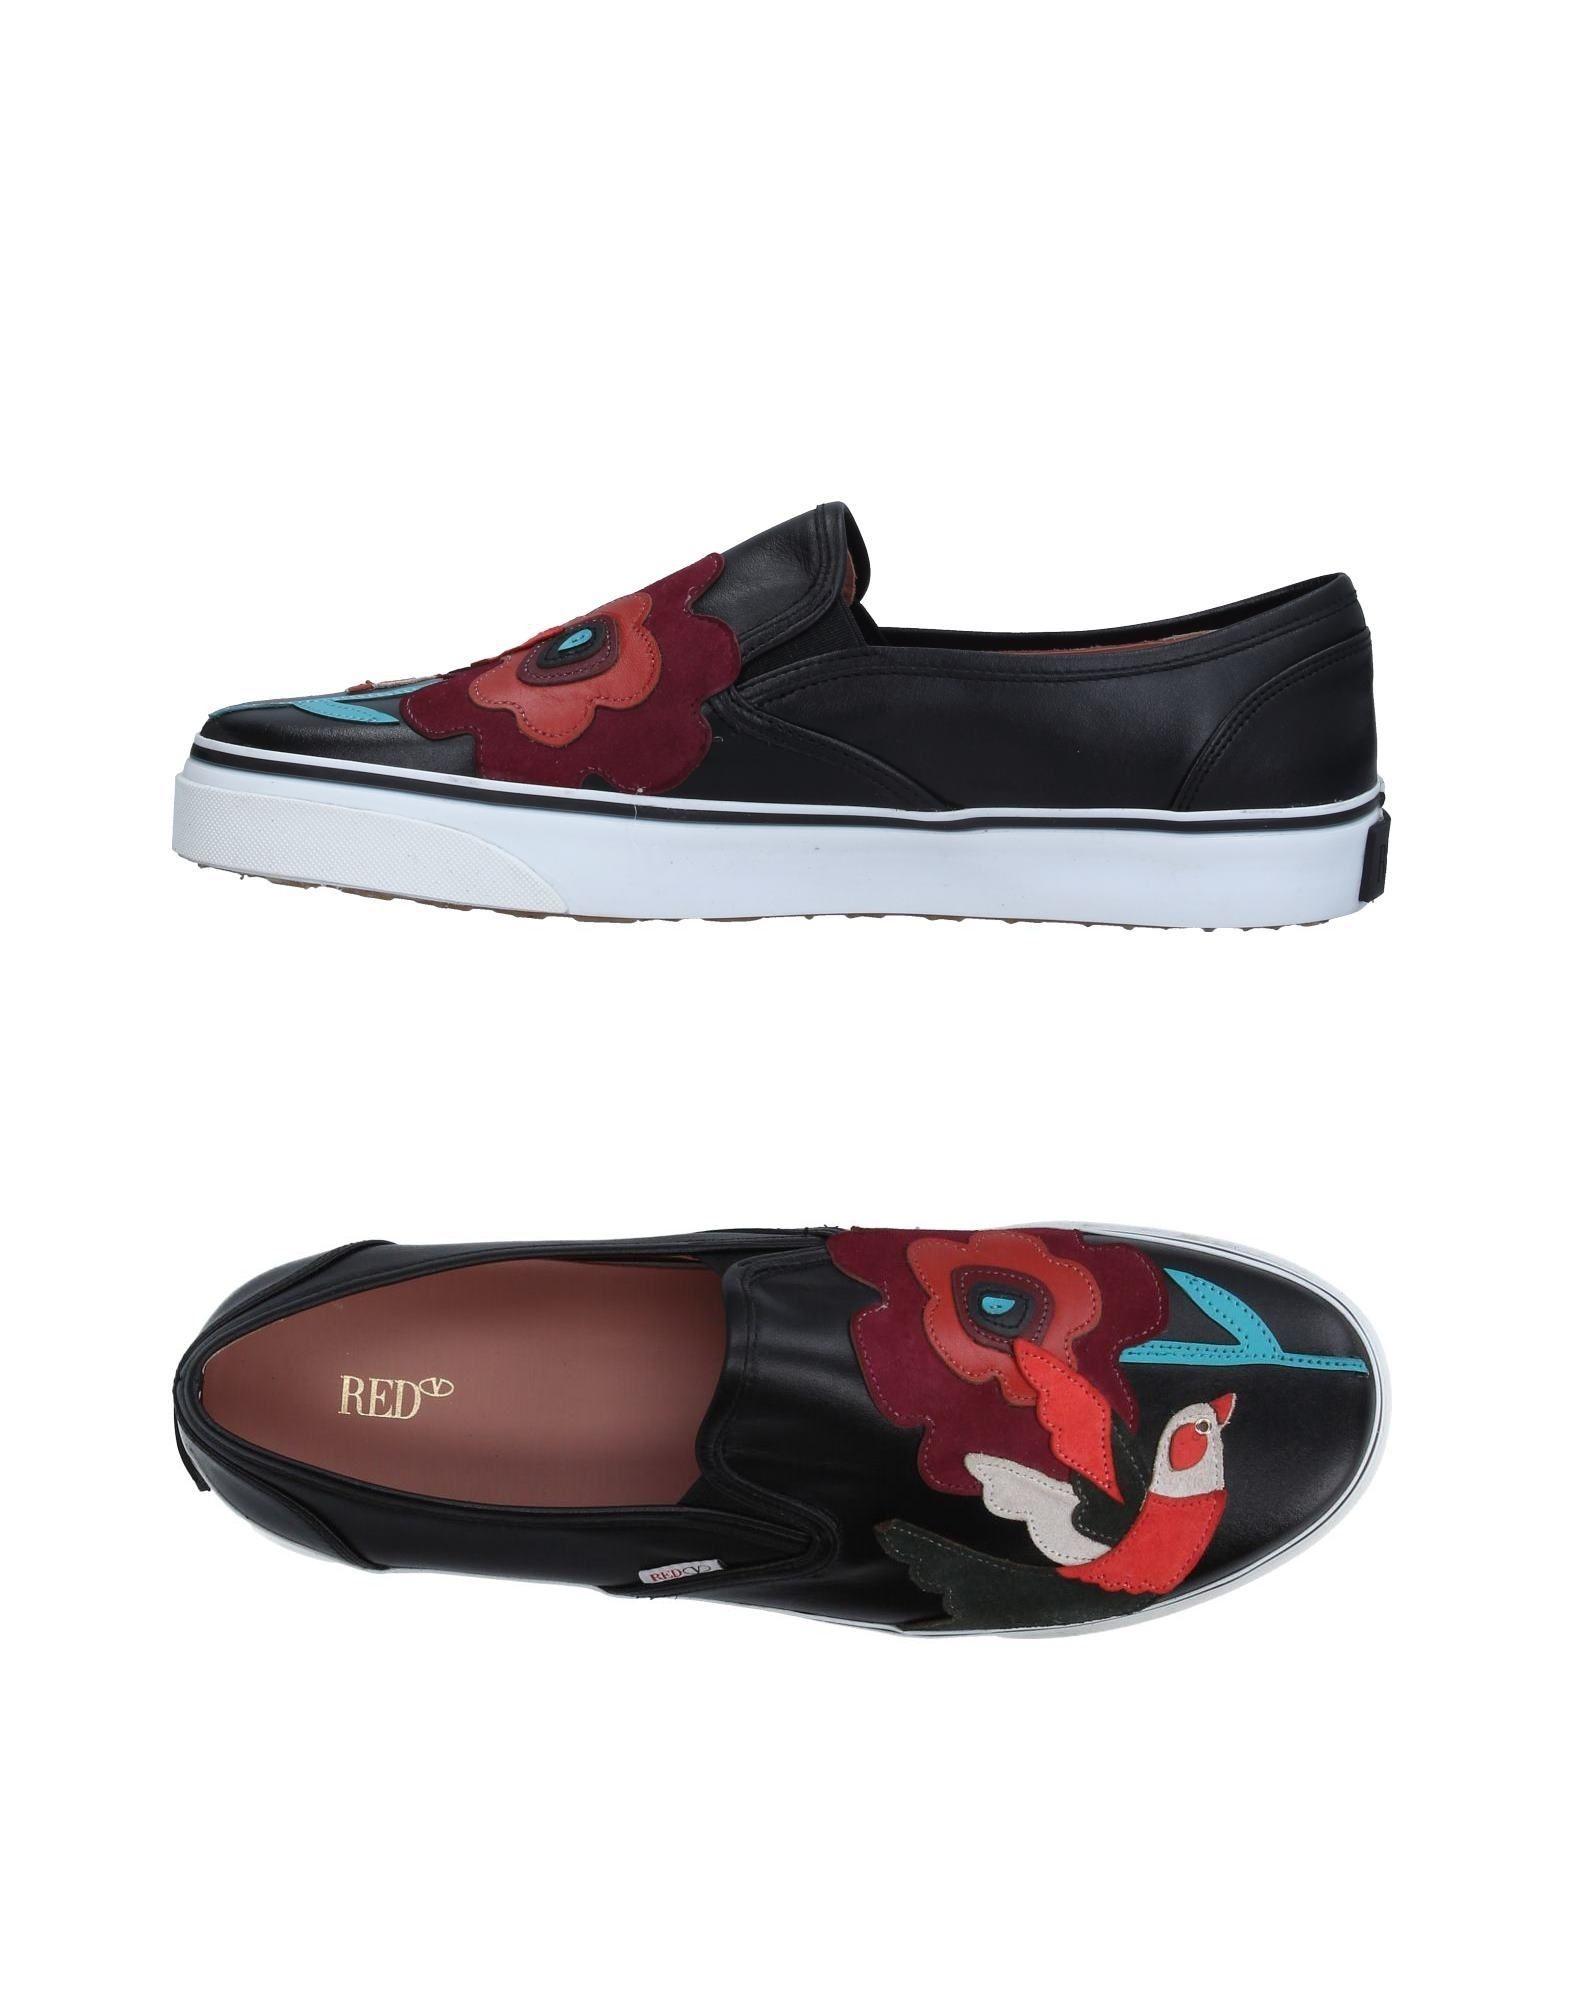 Red(V) Sneakers strapazierfähige Damen  11284339JTGut aussehende strapazierfähige Sneakers Schuhe 0b43f7